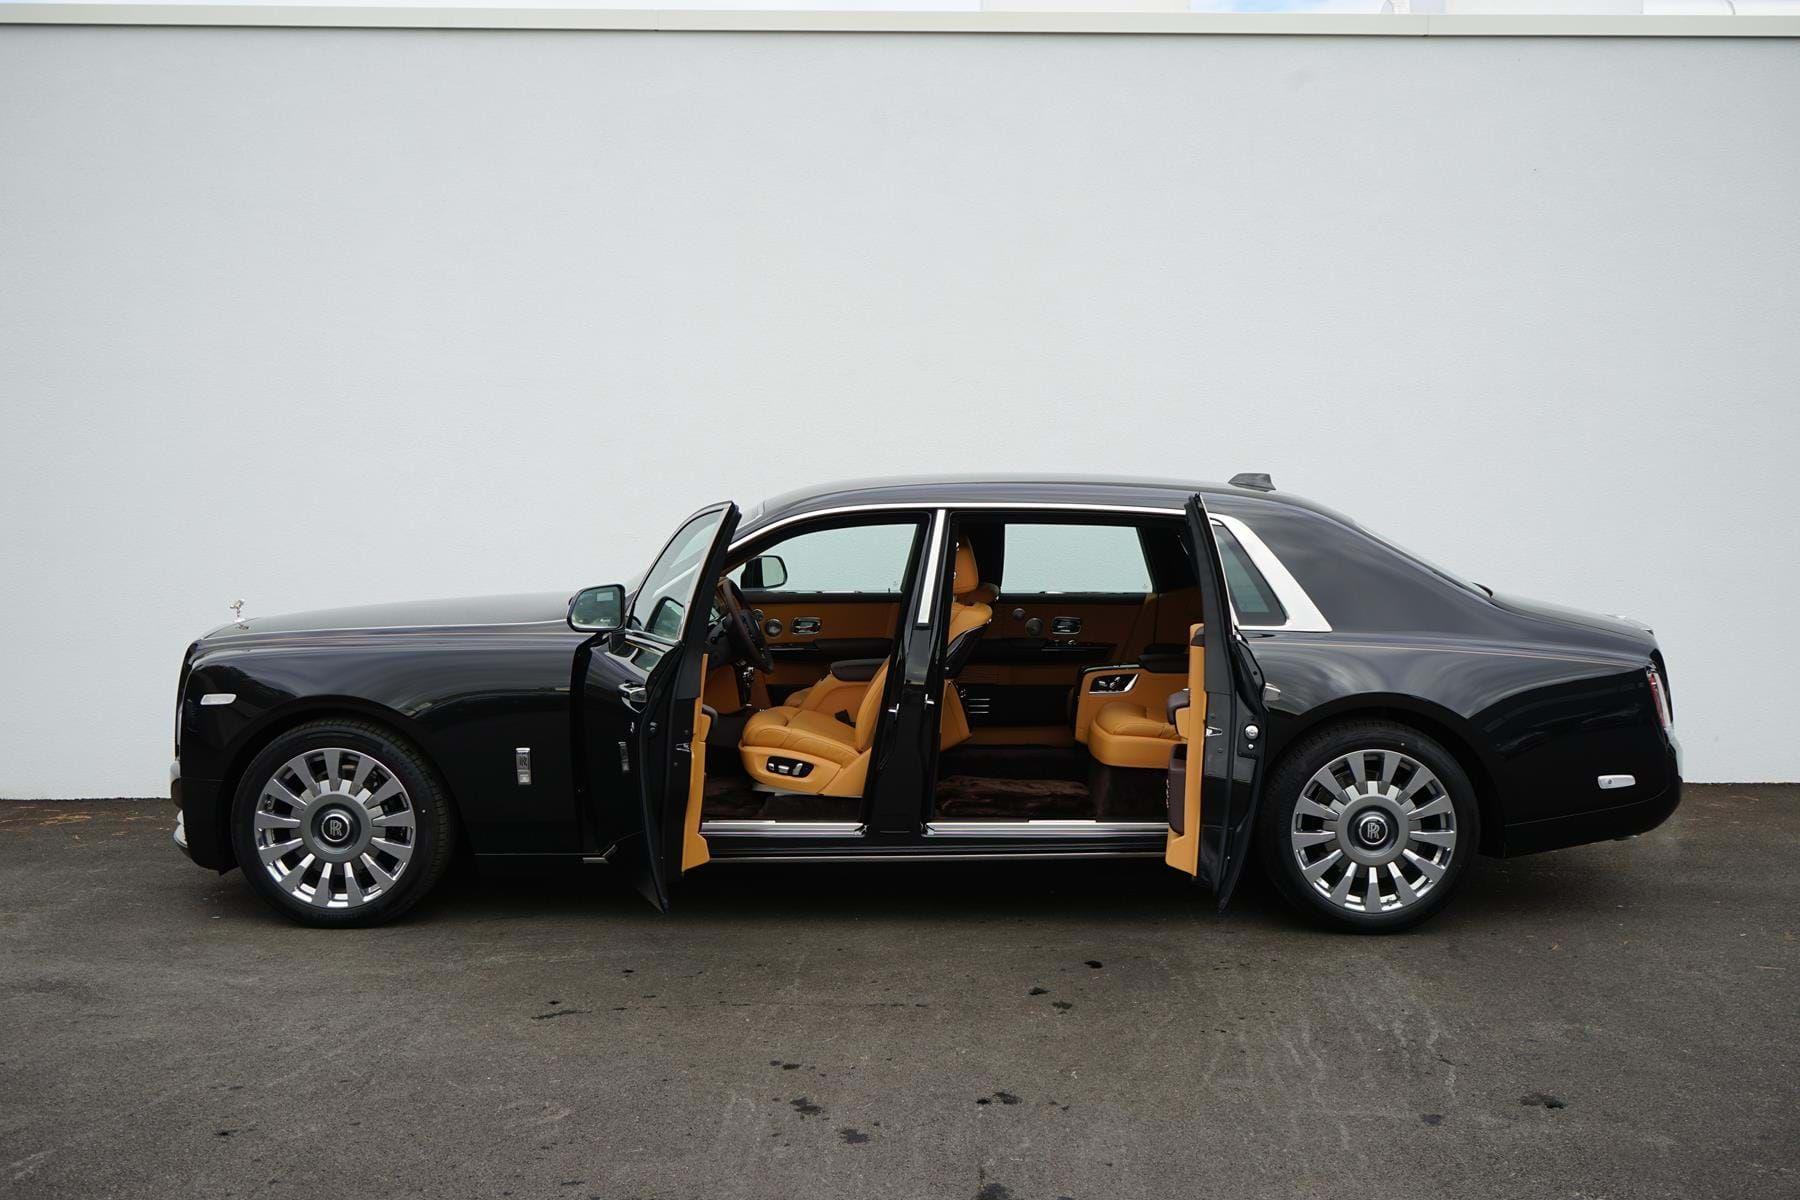 Rolls Royce Phantom Viii Extended Wheelbase Luxury Pulse Cars Swaziland For Sale On Luxurypulse Rolls Royce Phantom Rolls Royce Rolls Royce Cars